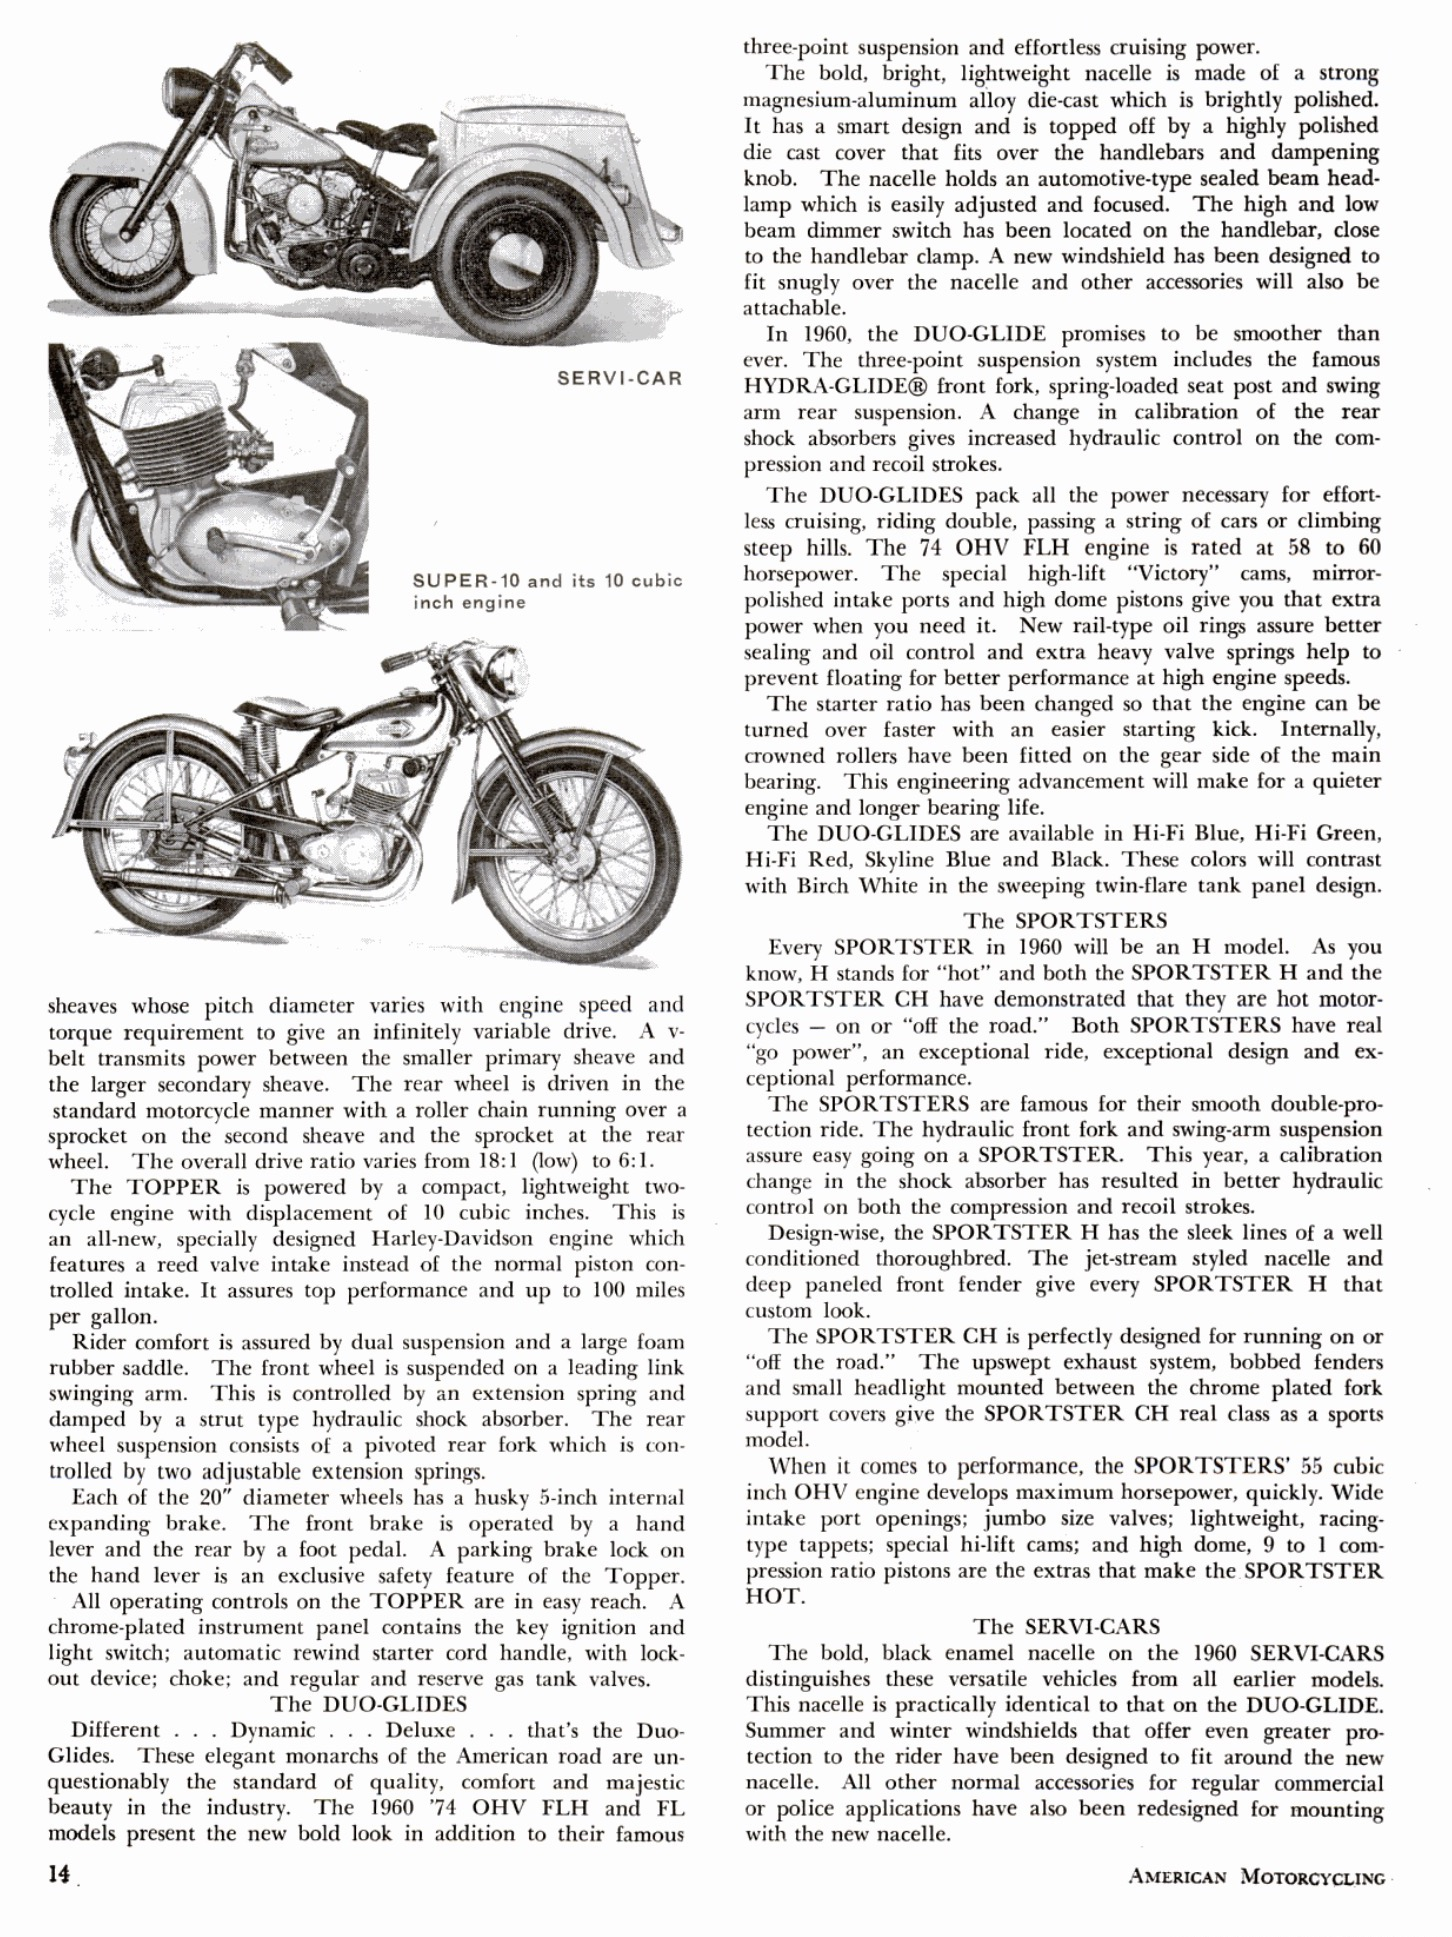 Modelos 1960 - 03